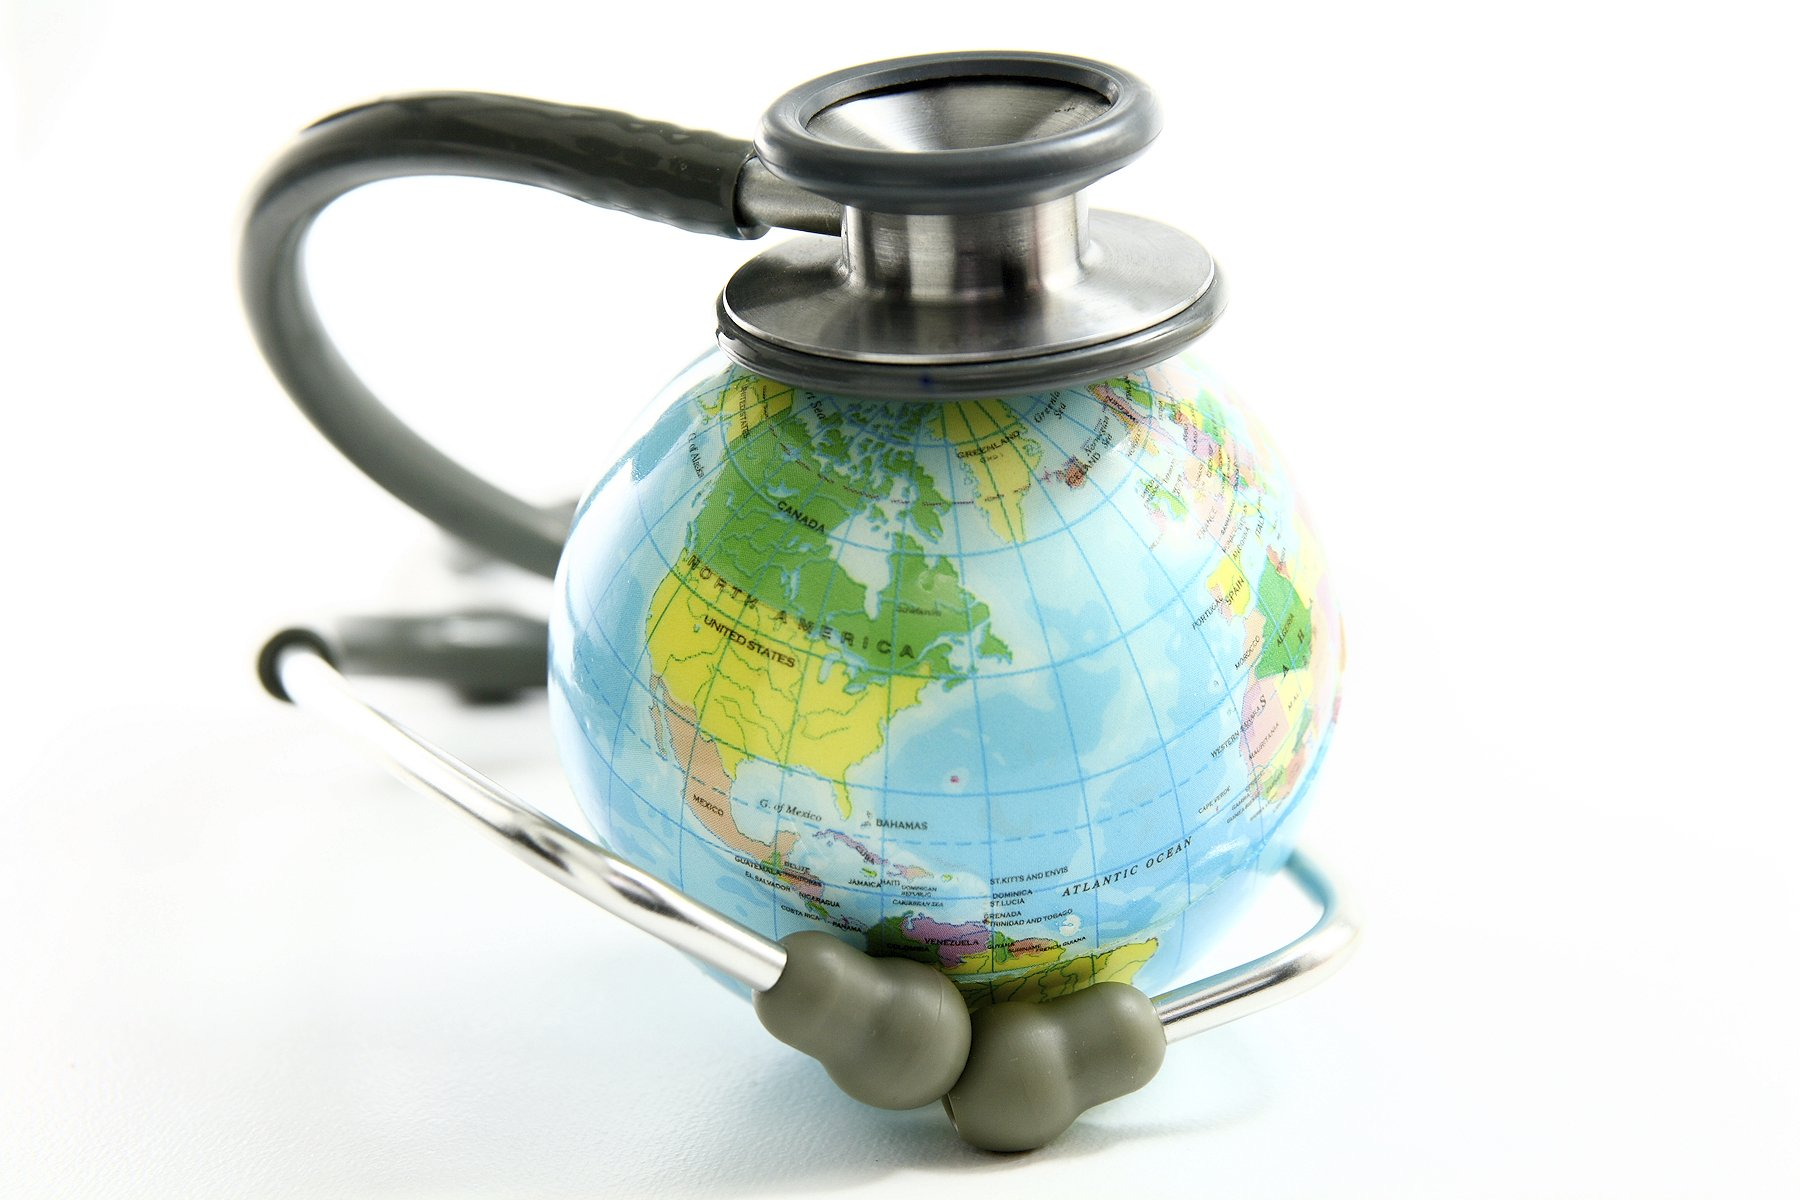 Online LPN Programs For International Students